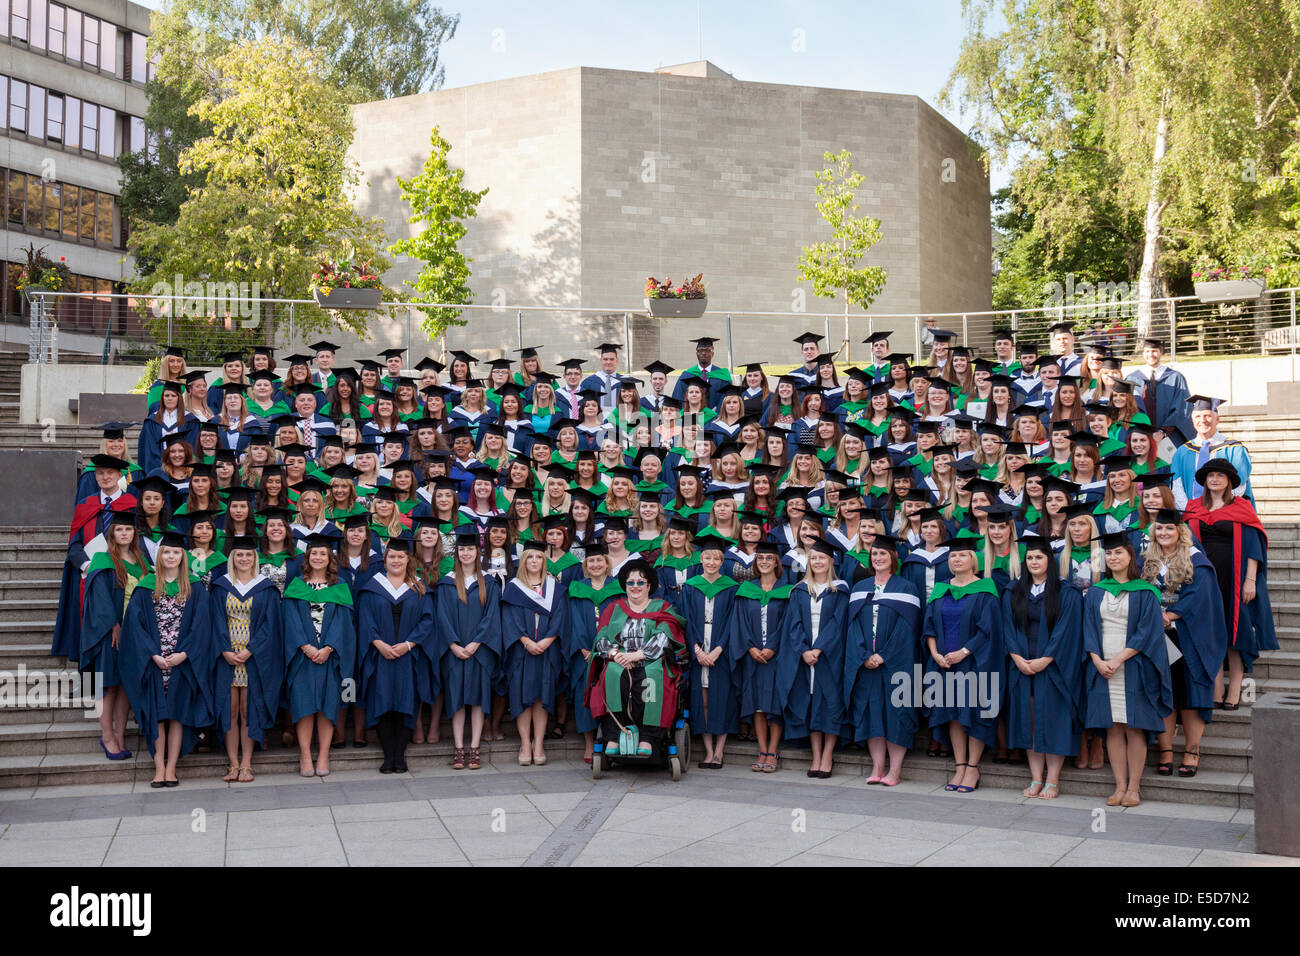 Nurses graduating on the nursing graduates cohort graduation day, UEA ( University of East Anglia ), Norwich England - Stock Image